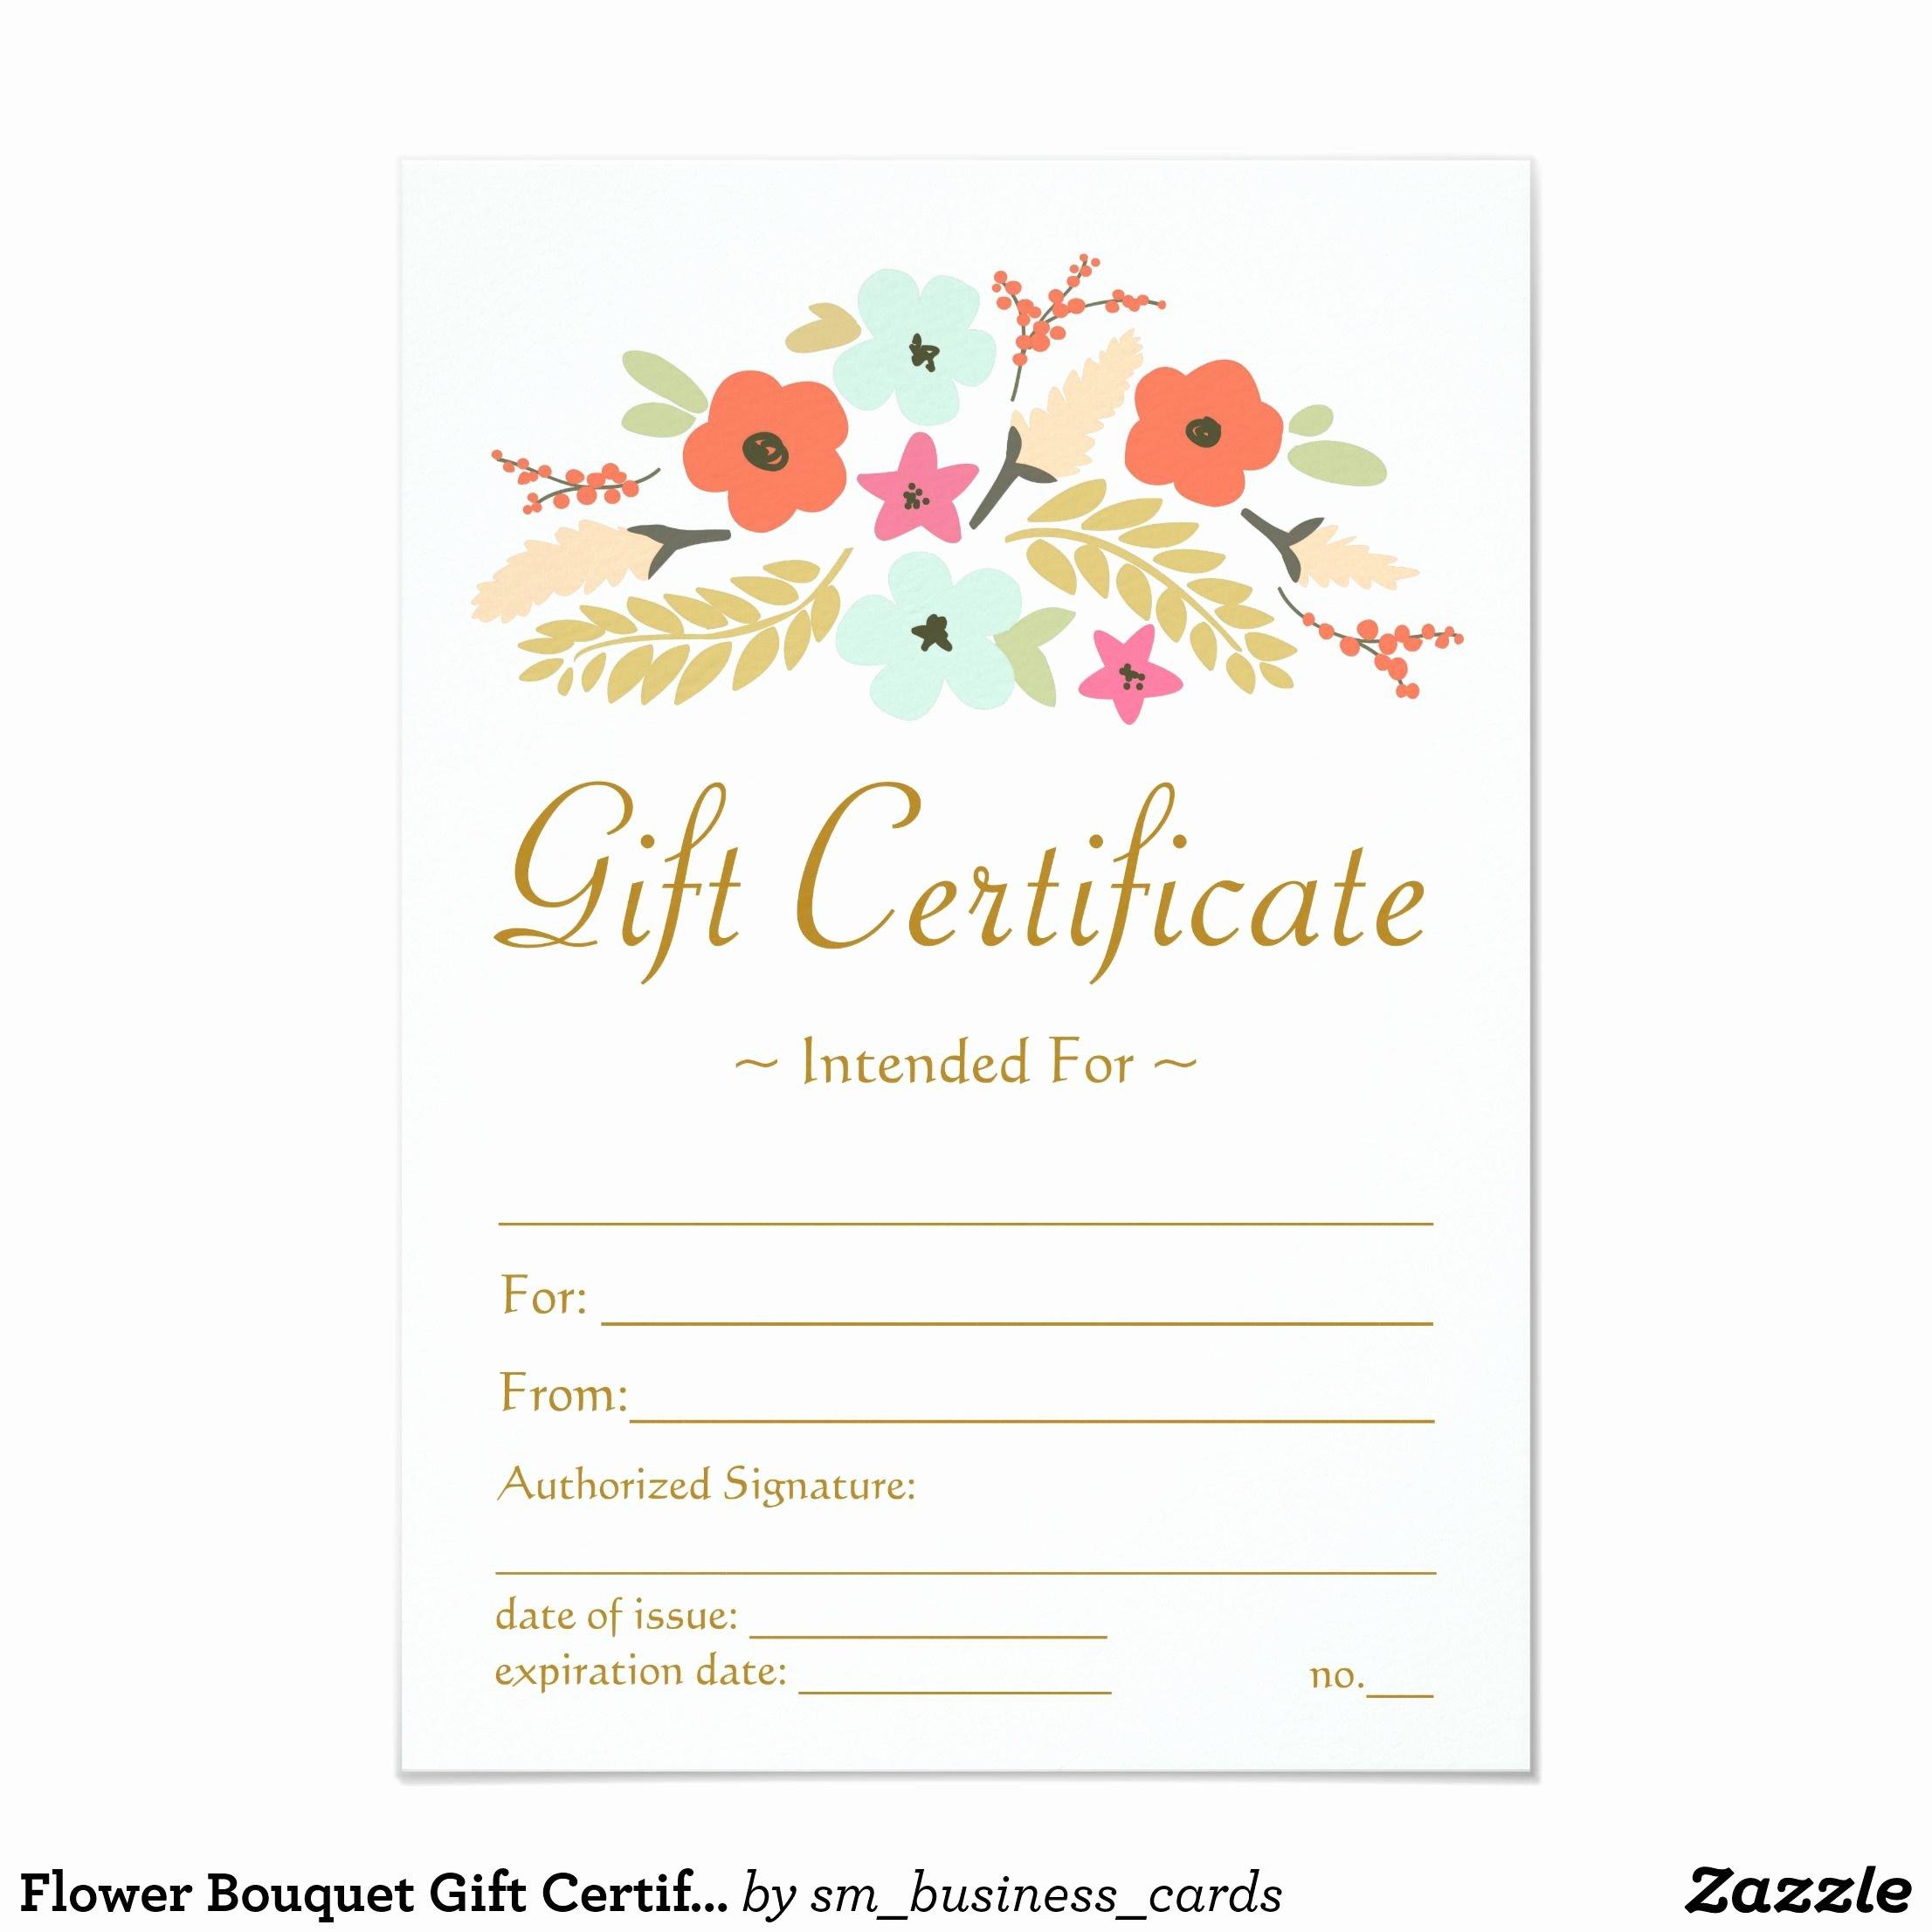 Massage Gift Certificate Template Elegant Flower Bouquet Gift Certificate Zazzle Massage